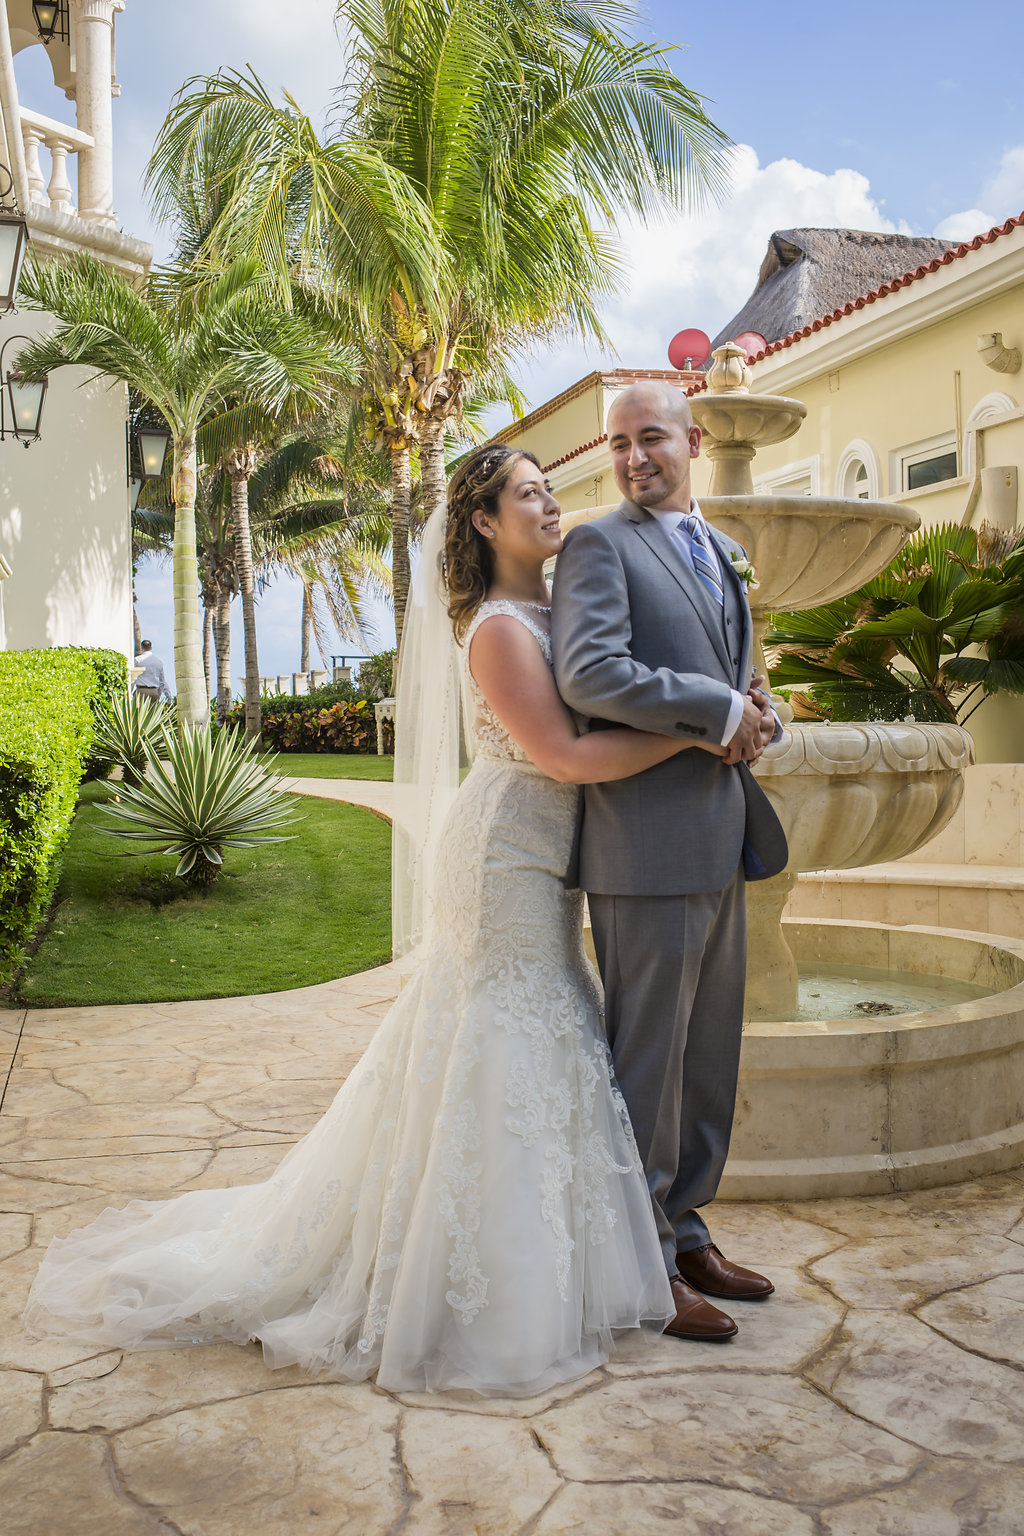 yesica-jose-beach-wedding-Villa-La-Joya--Playa-del-carmen-01--17.jpg